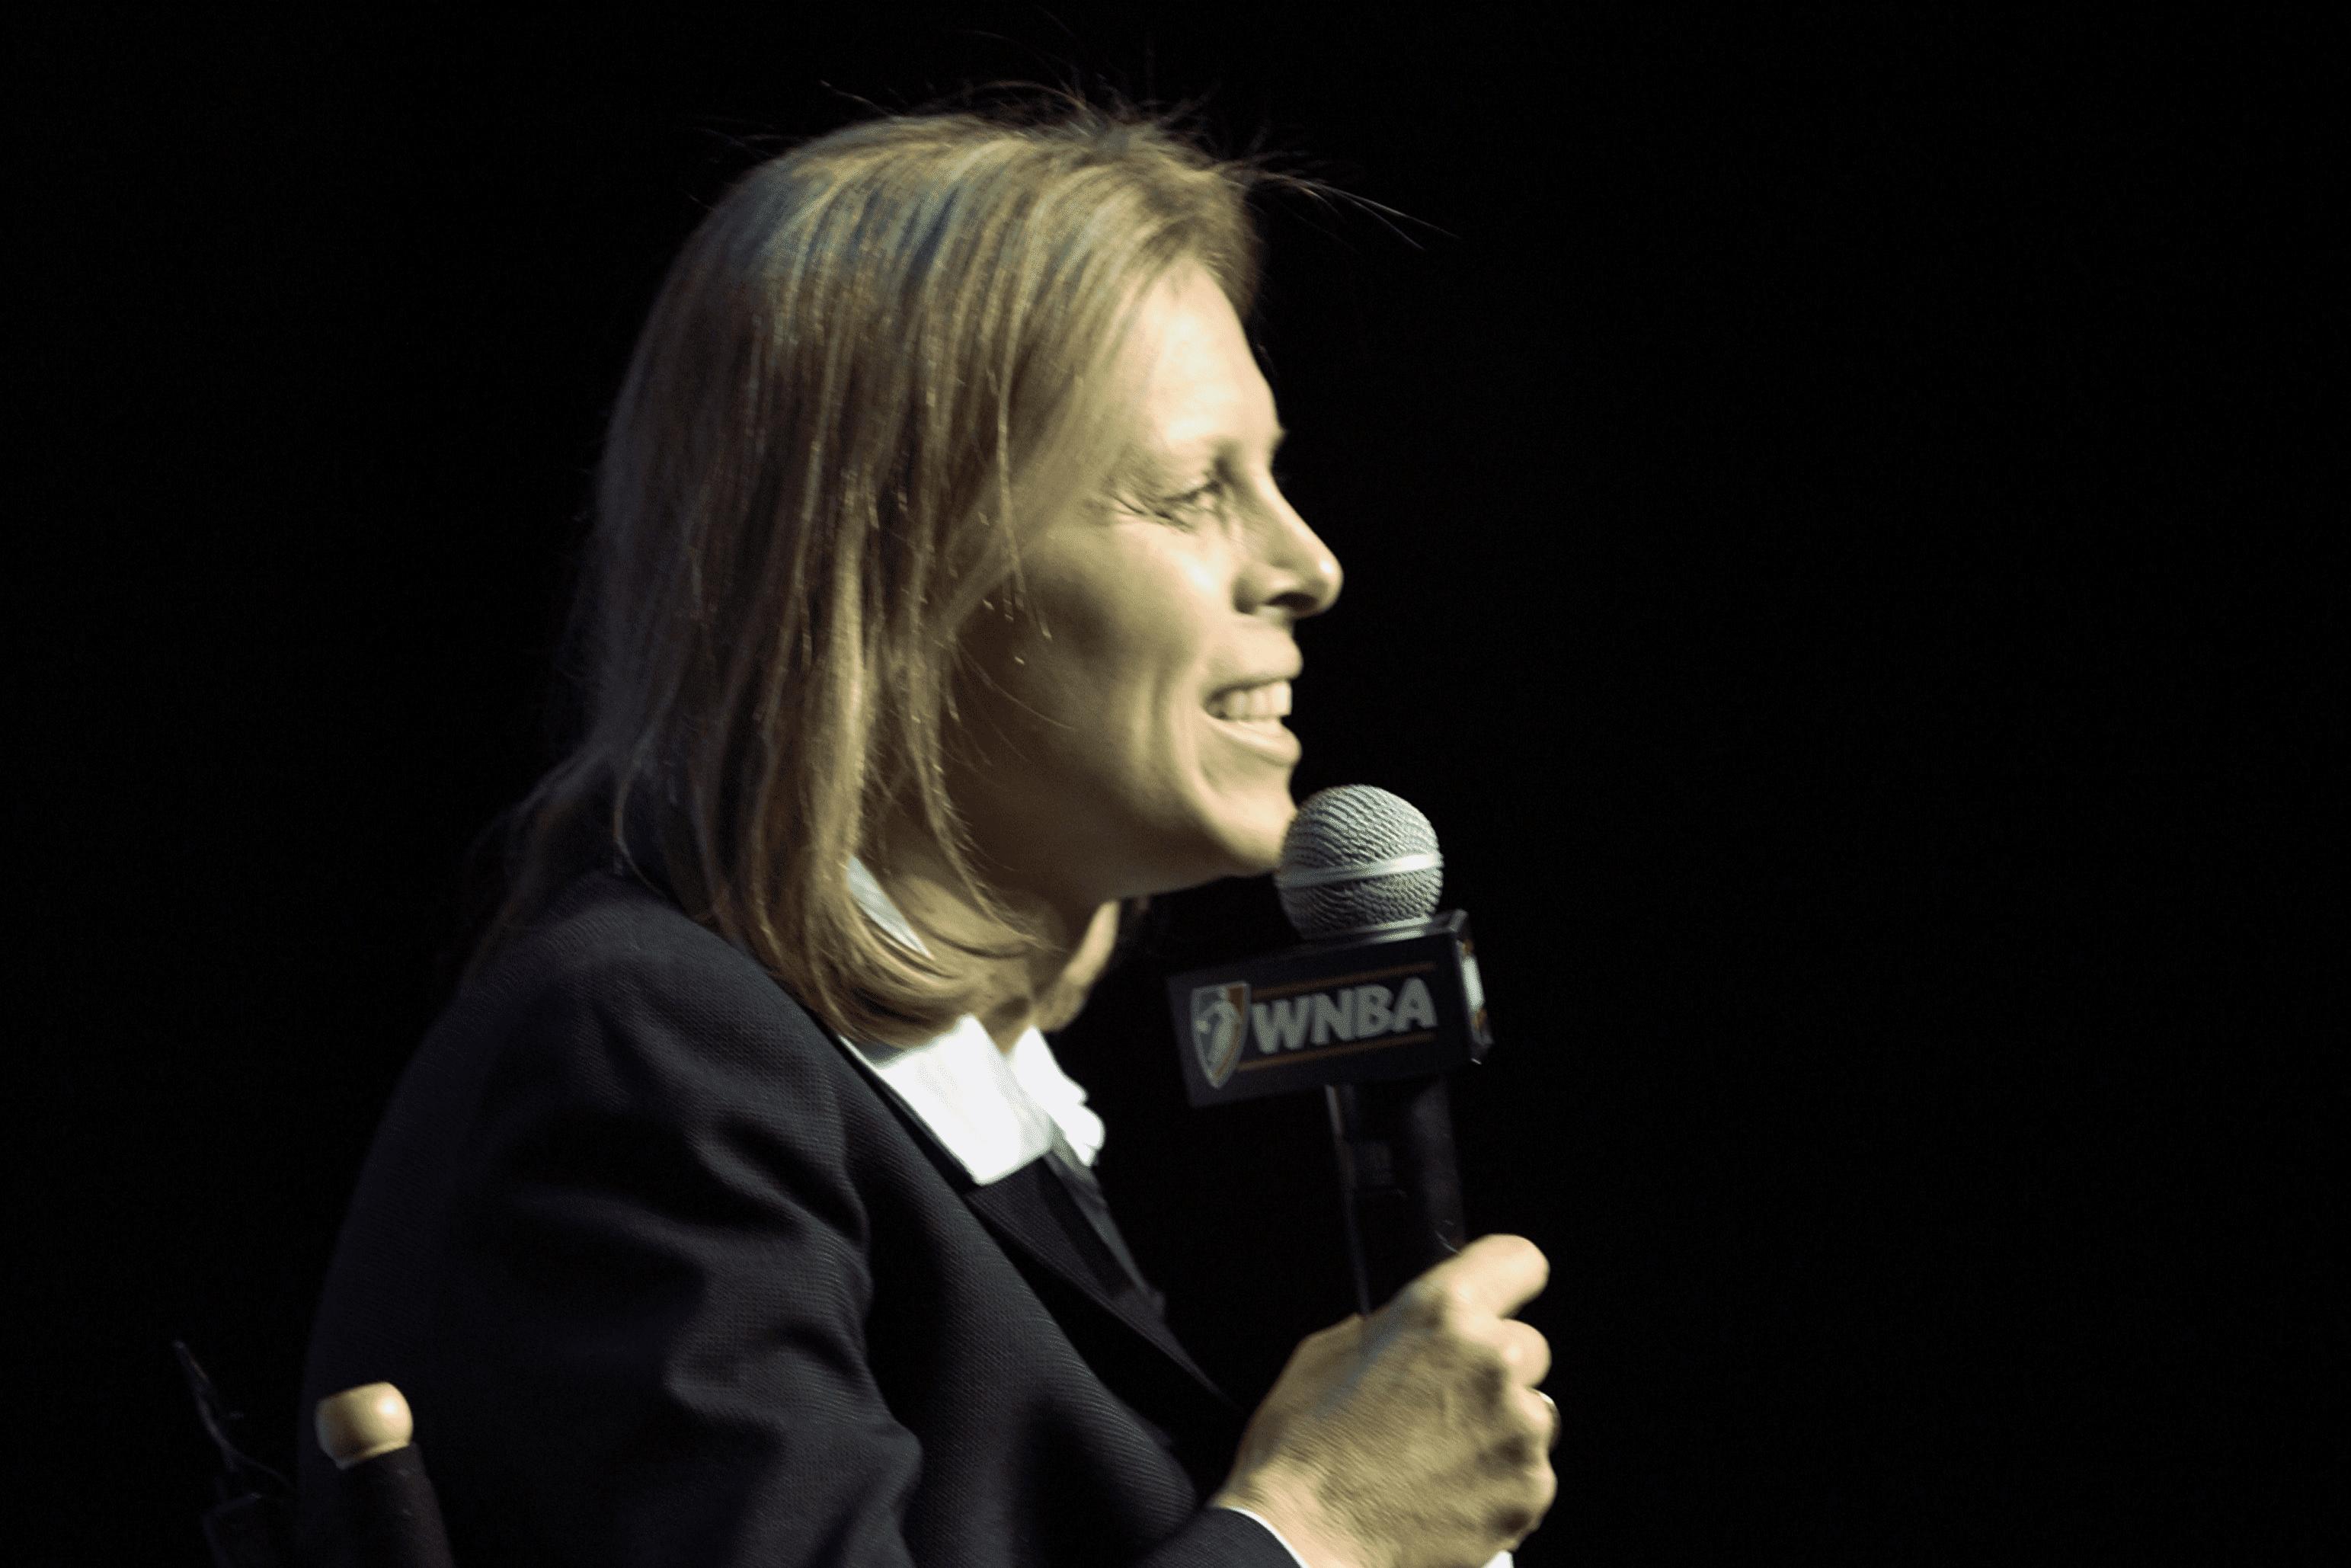 Valerie Ackerman, WNBA President, 2003